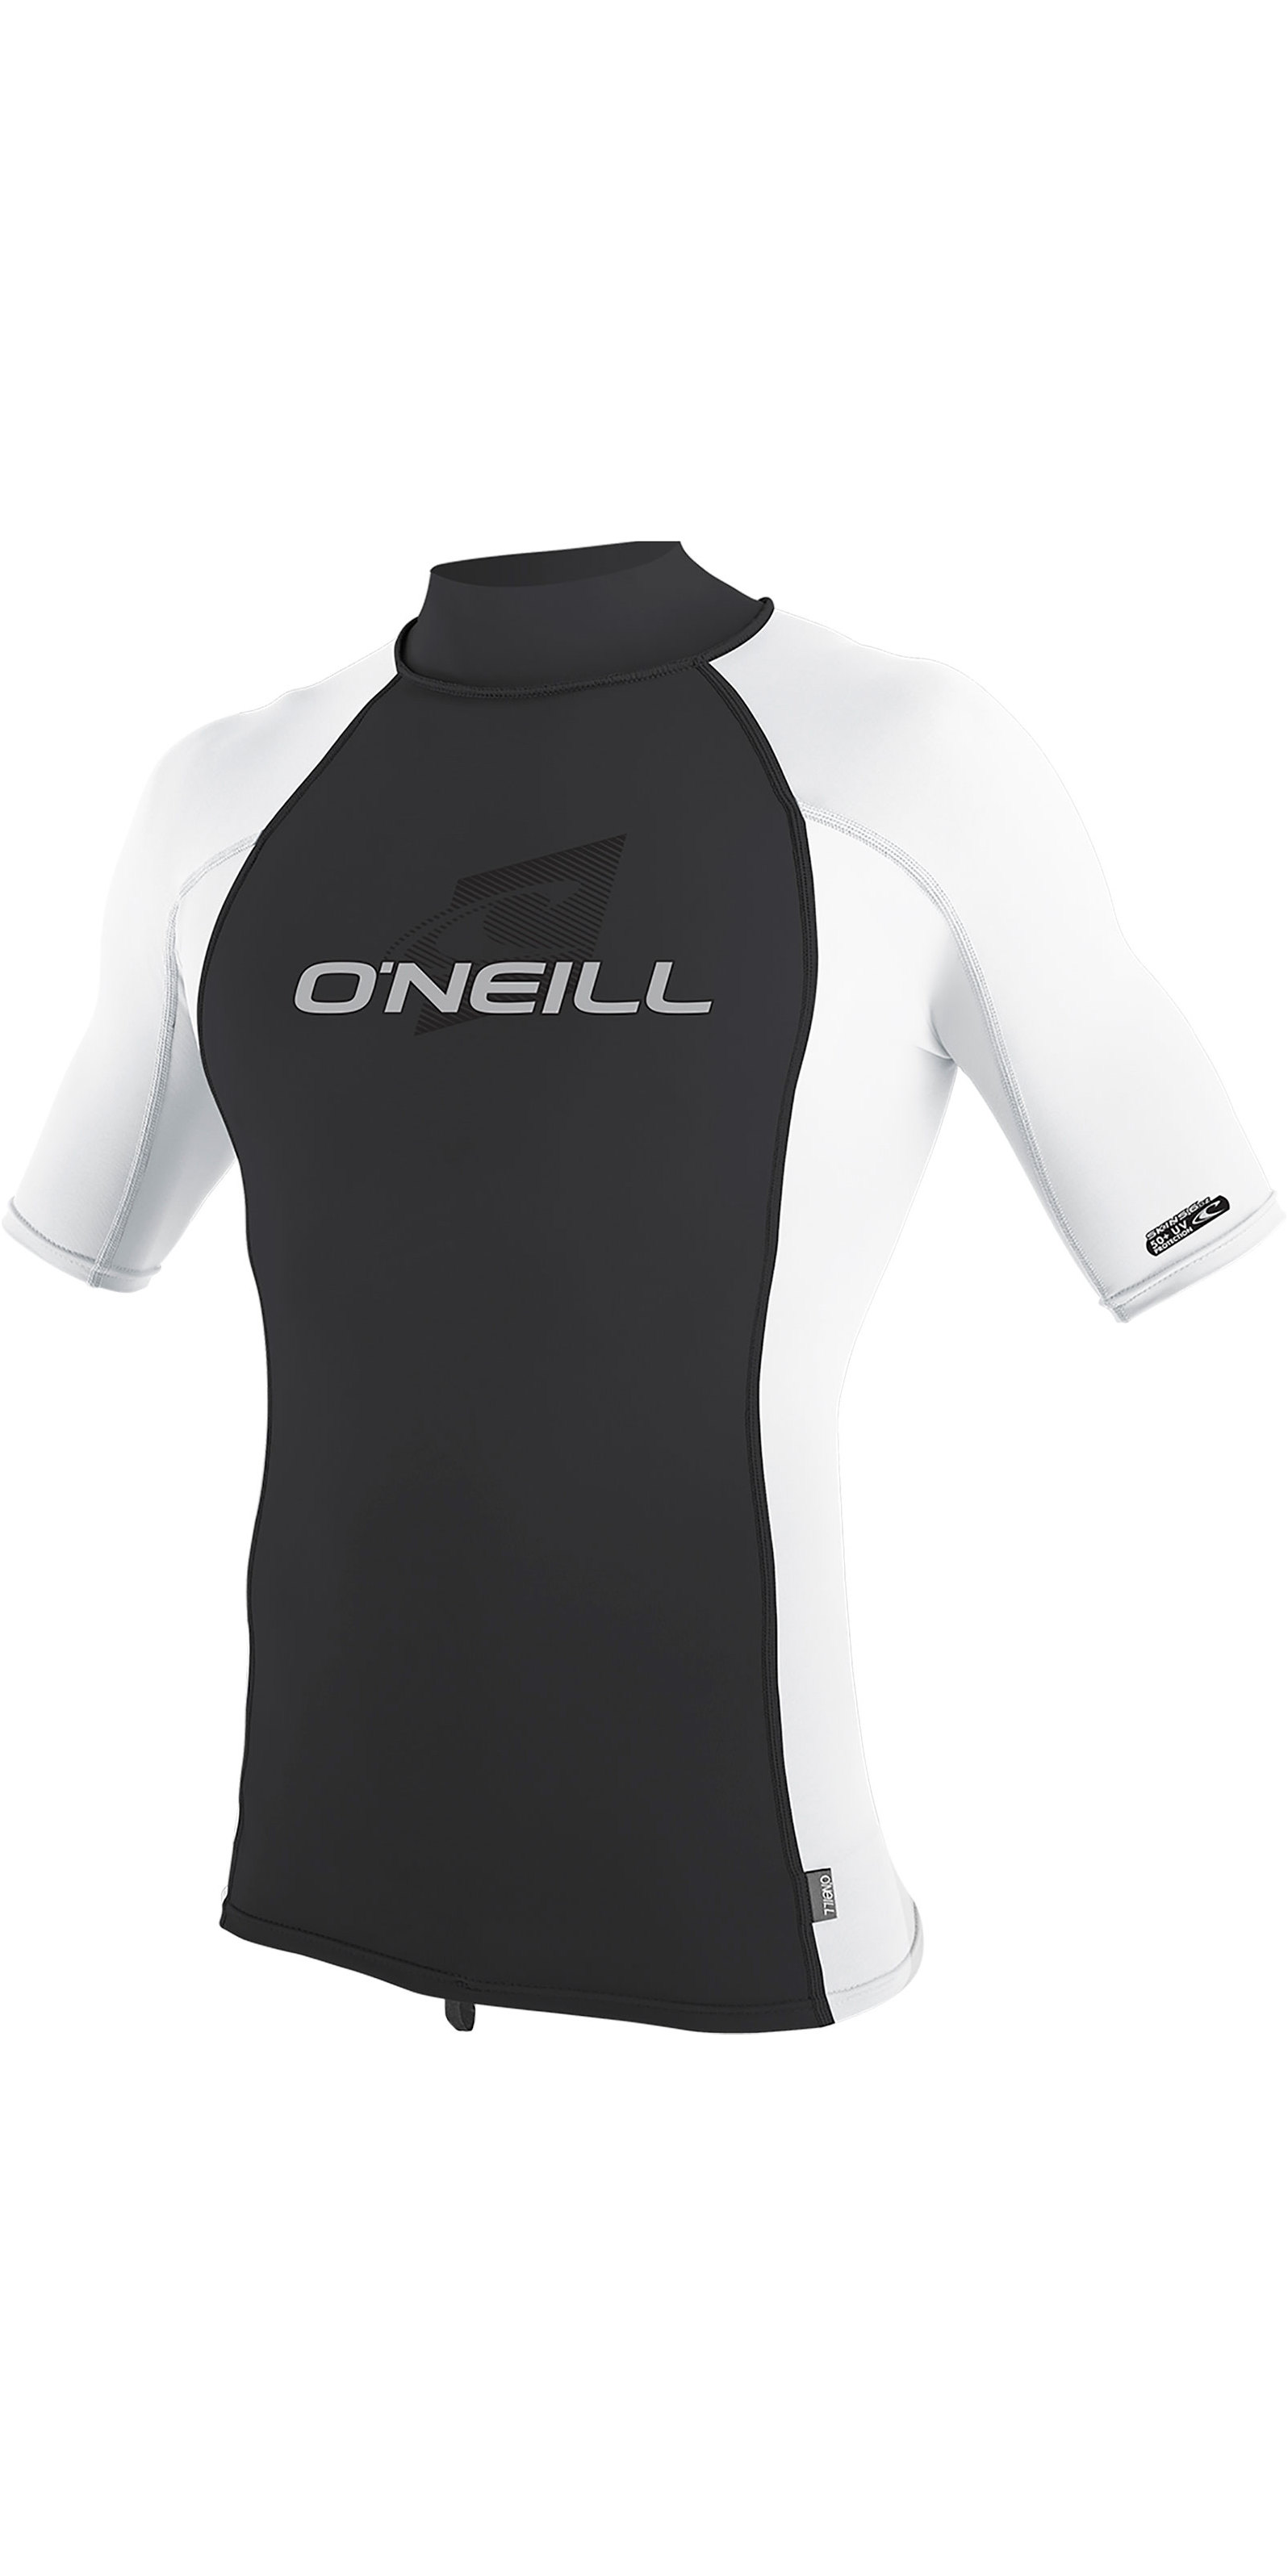 944daaf3d85 2019 Oneill Skins Short Sleeve Turtle Neck Rash Vest White Midnite Oil 4517  - Short Sleeve | Wetsuit Outlet